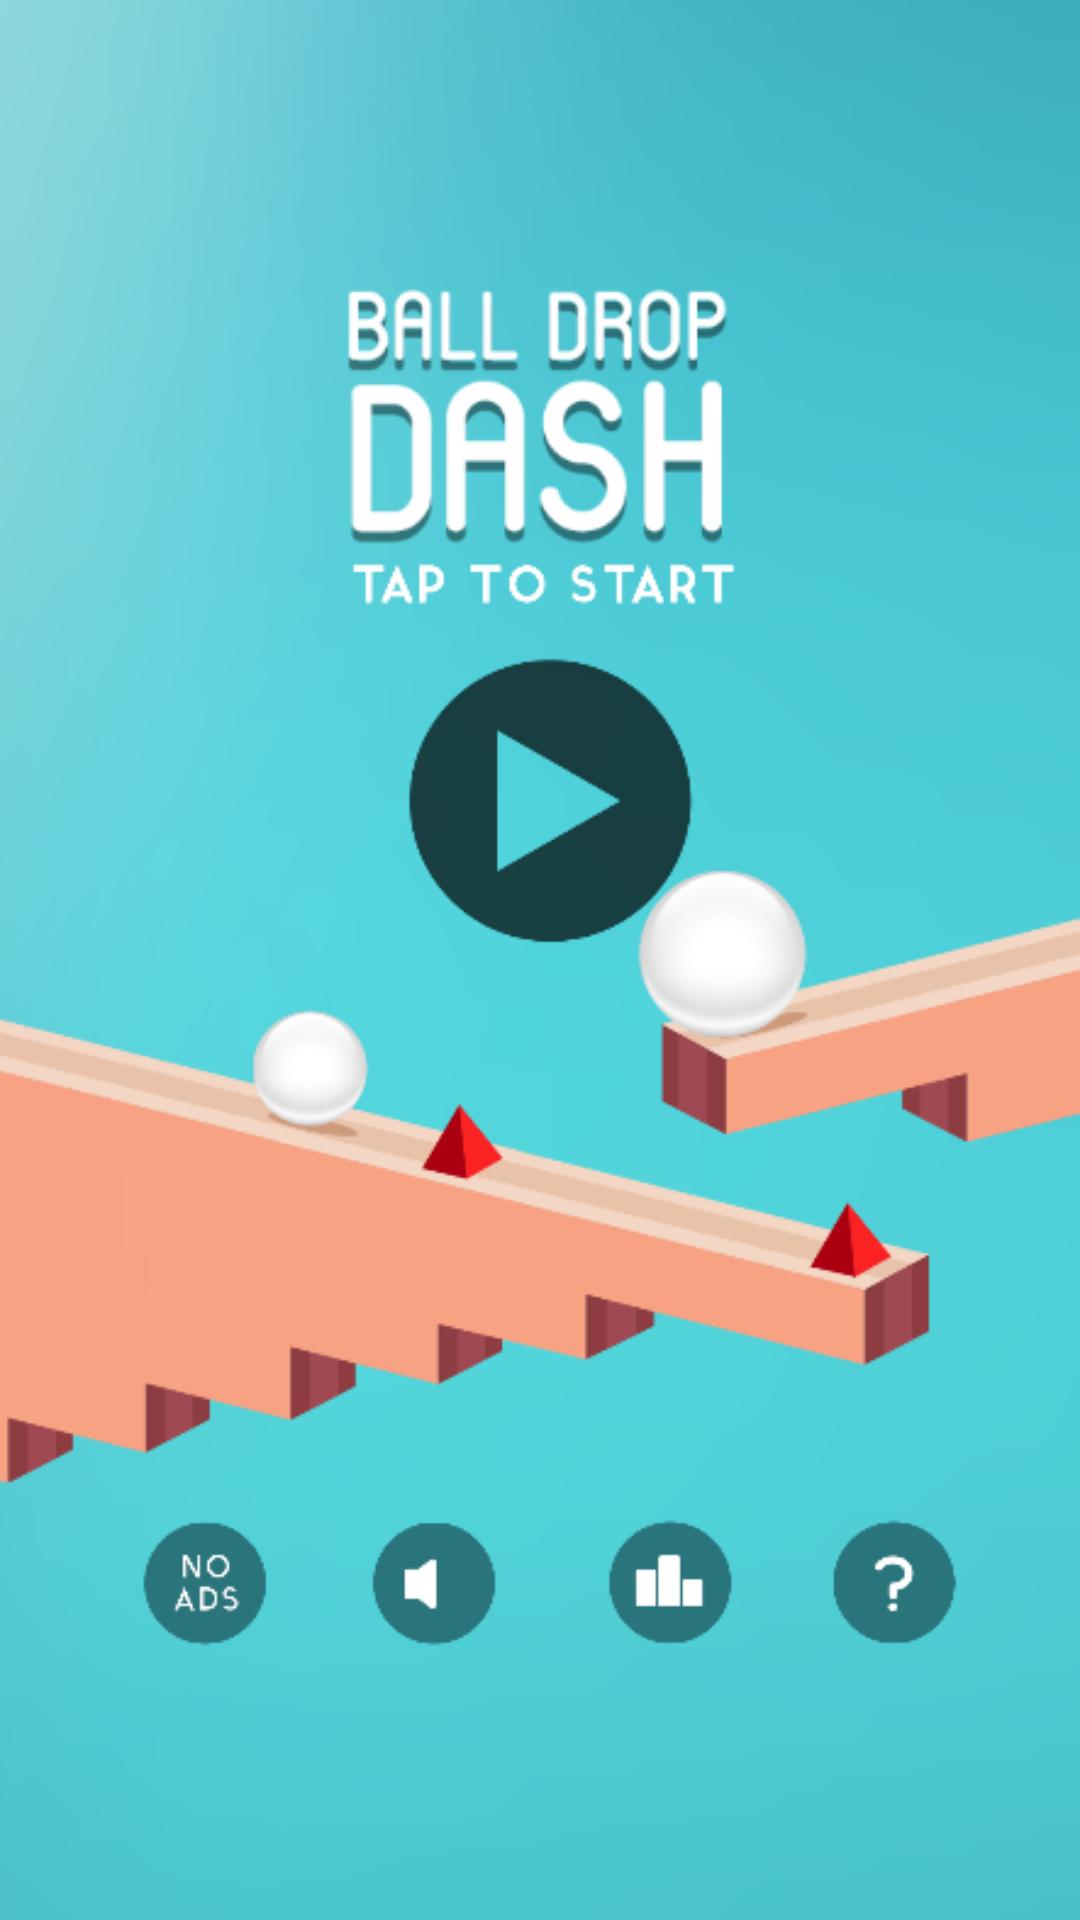 Ball Drop Dash